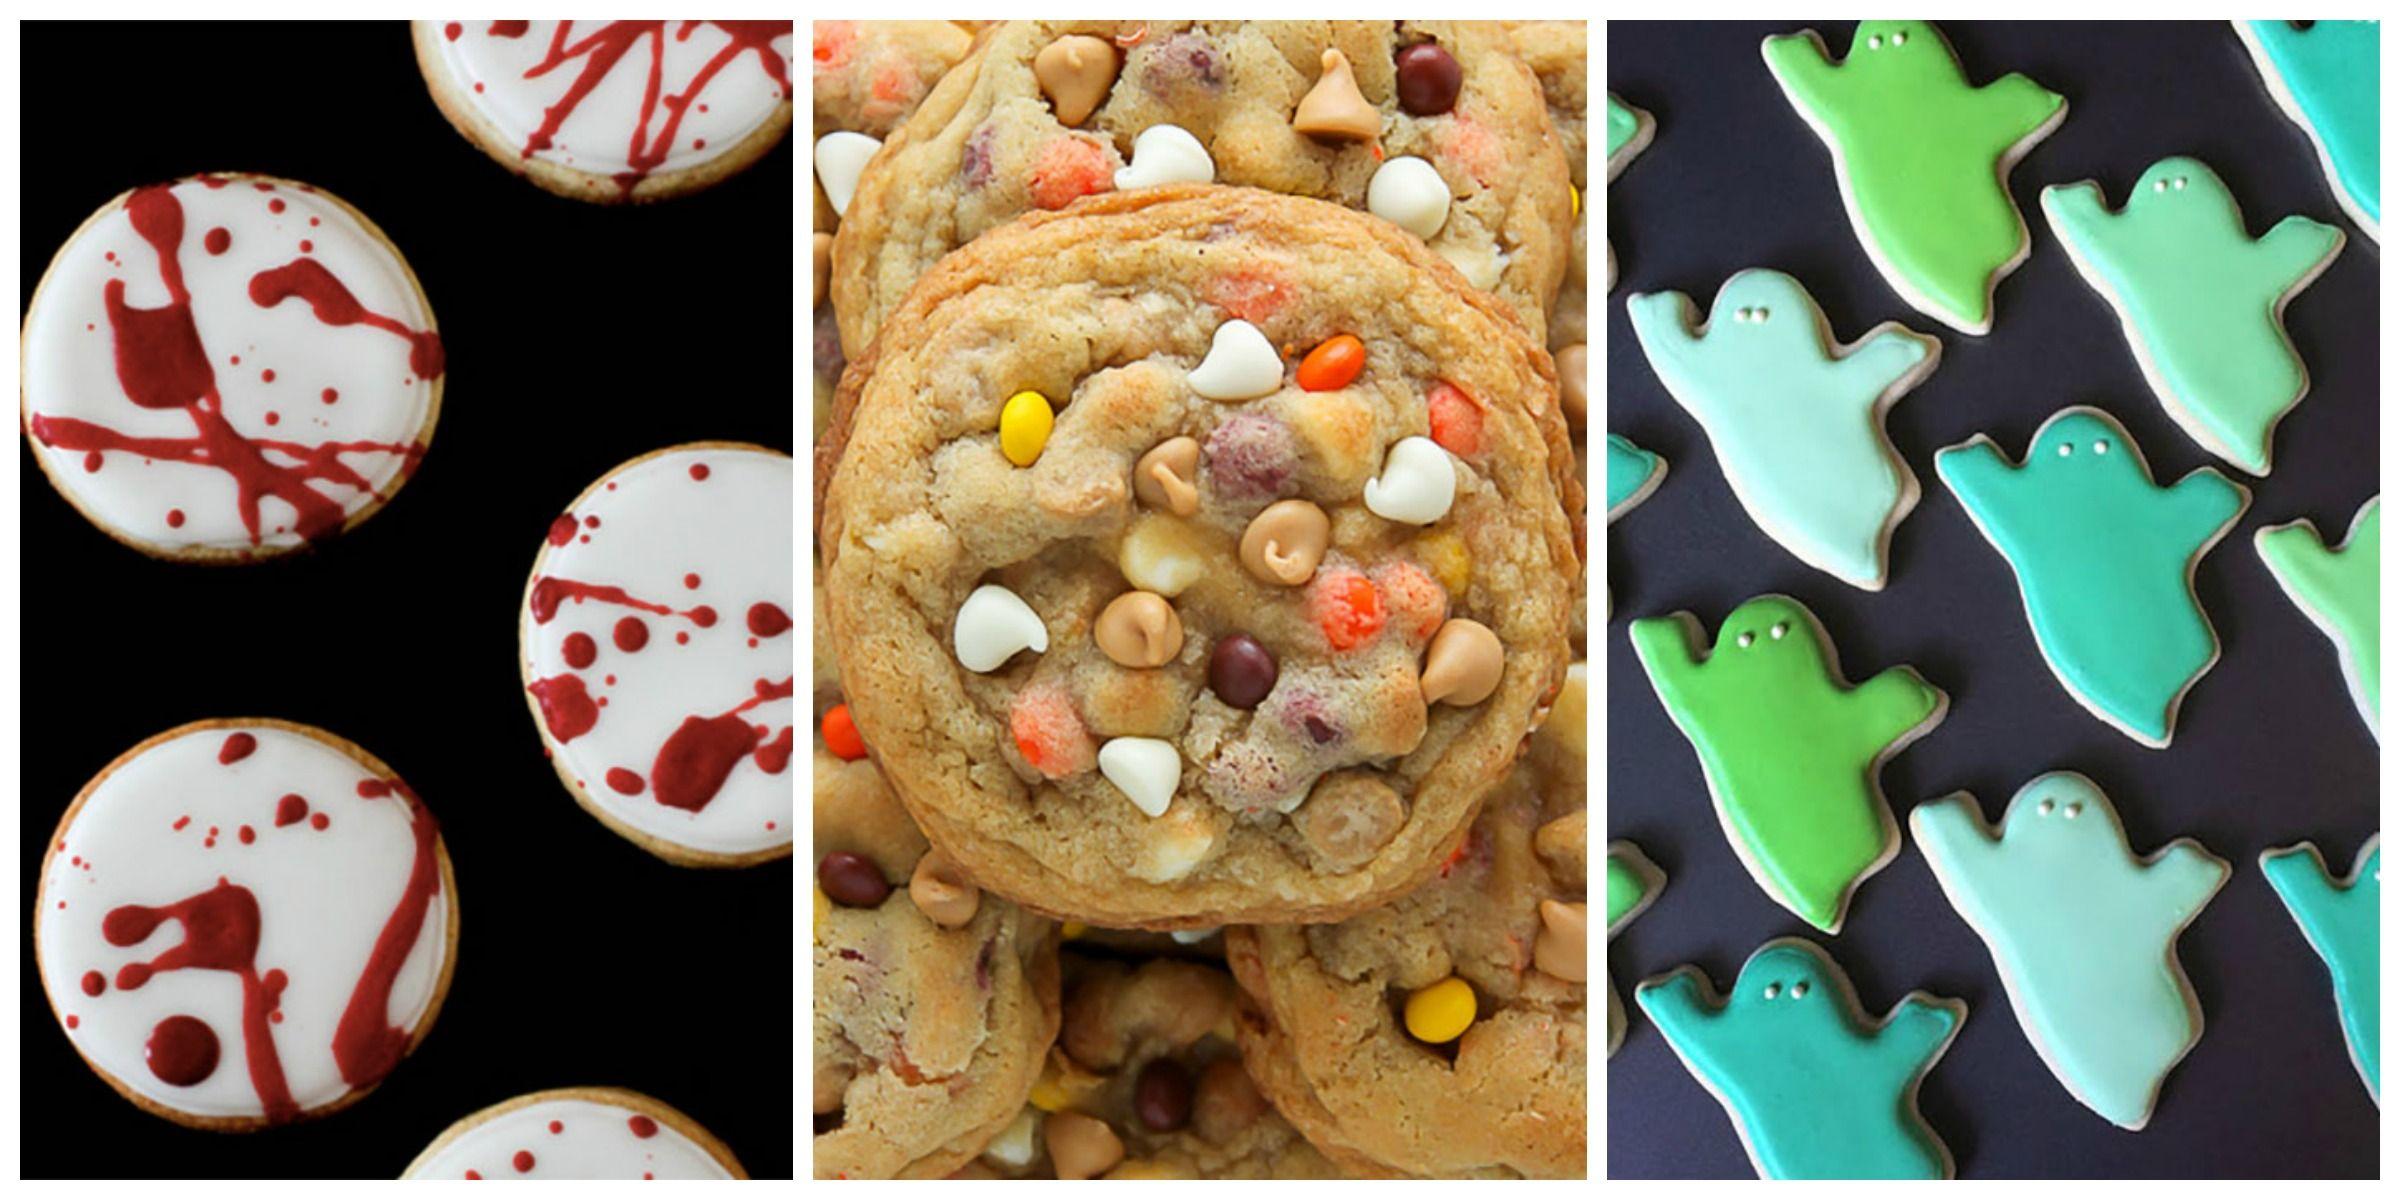 e2f35ccf11b 24 Best Halloween Cookie Recipes - Spooky Halloween Cookie Ideas